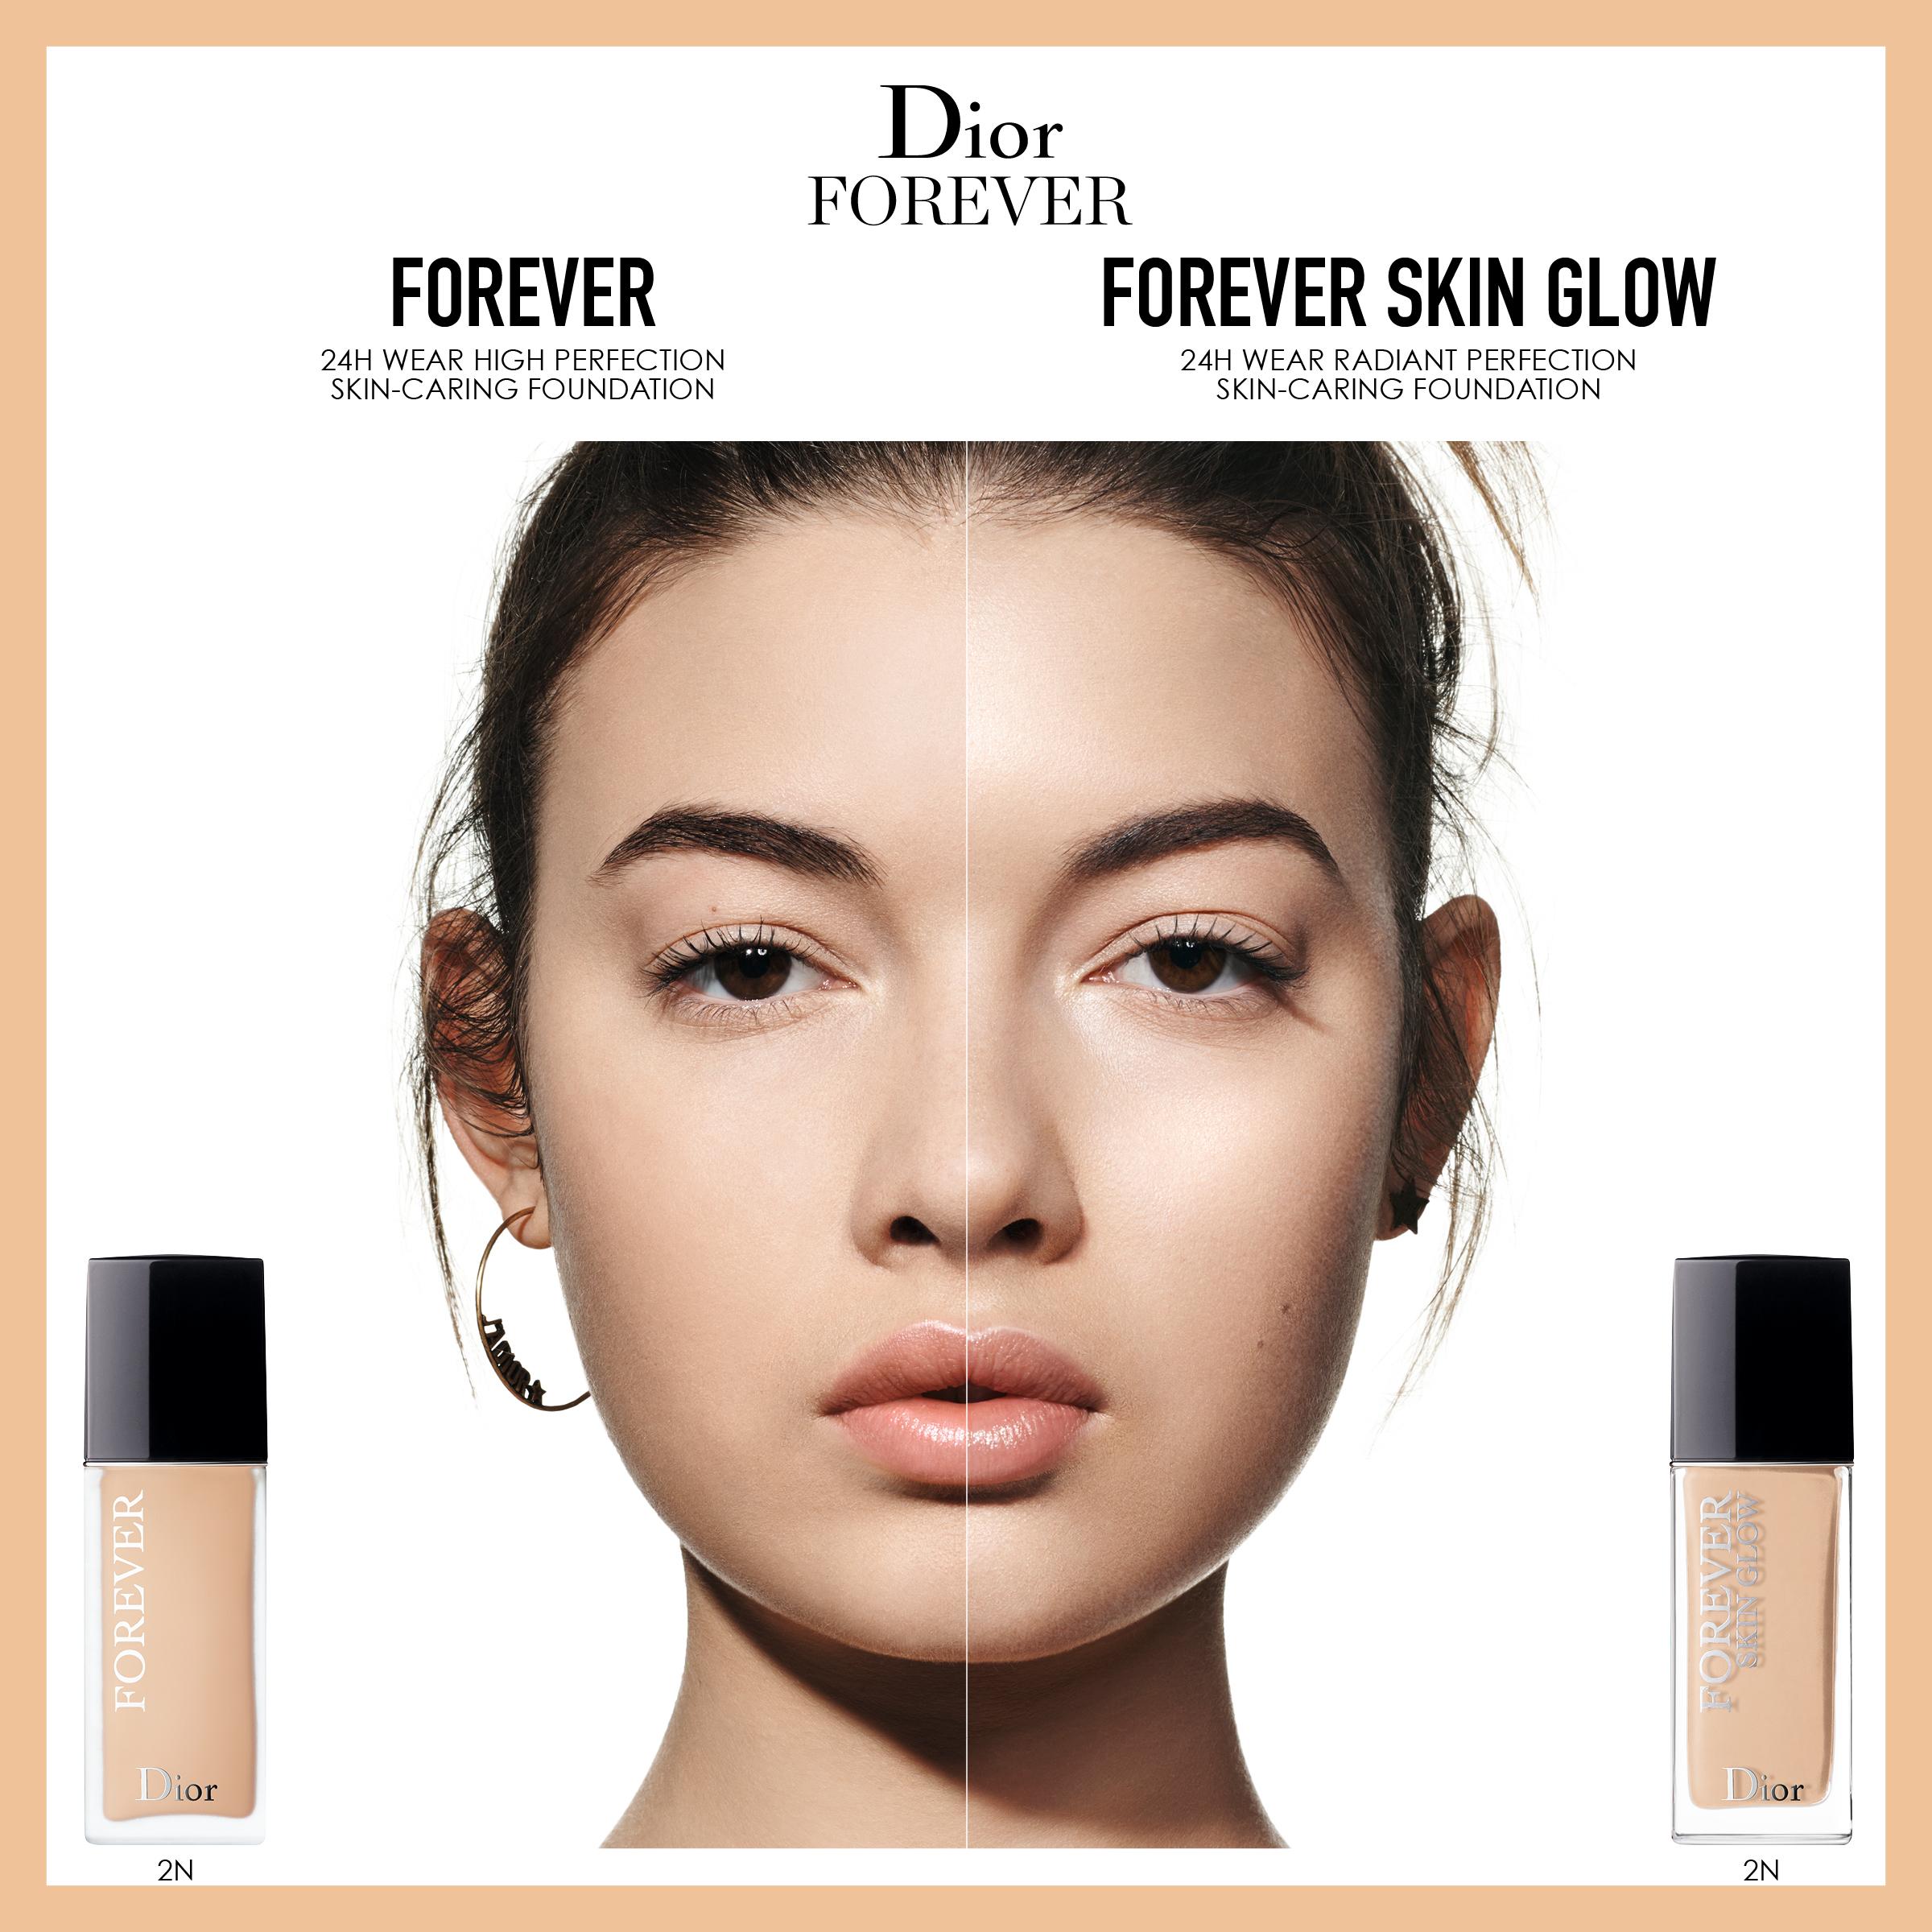 DIOR Forever Fluid Foundation, 3.5 Neutral